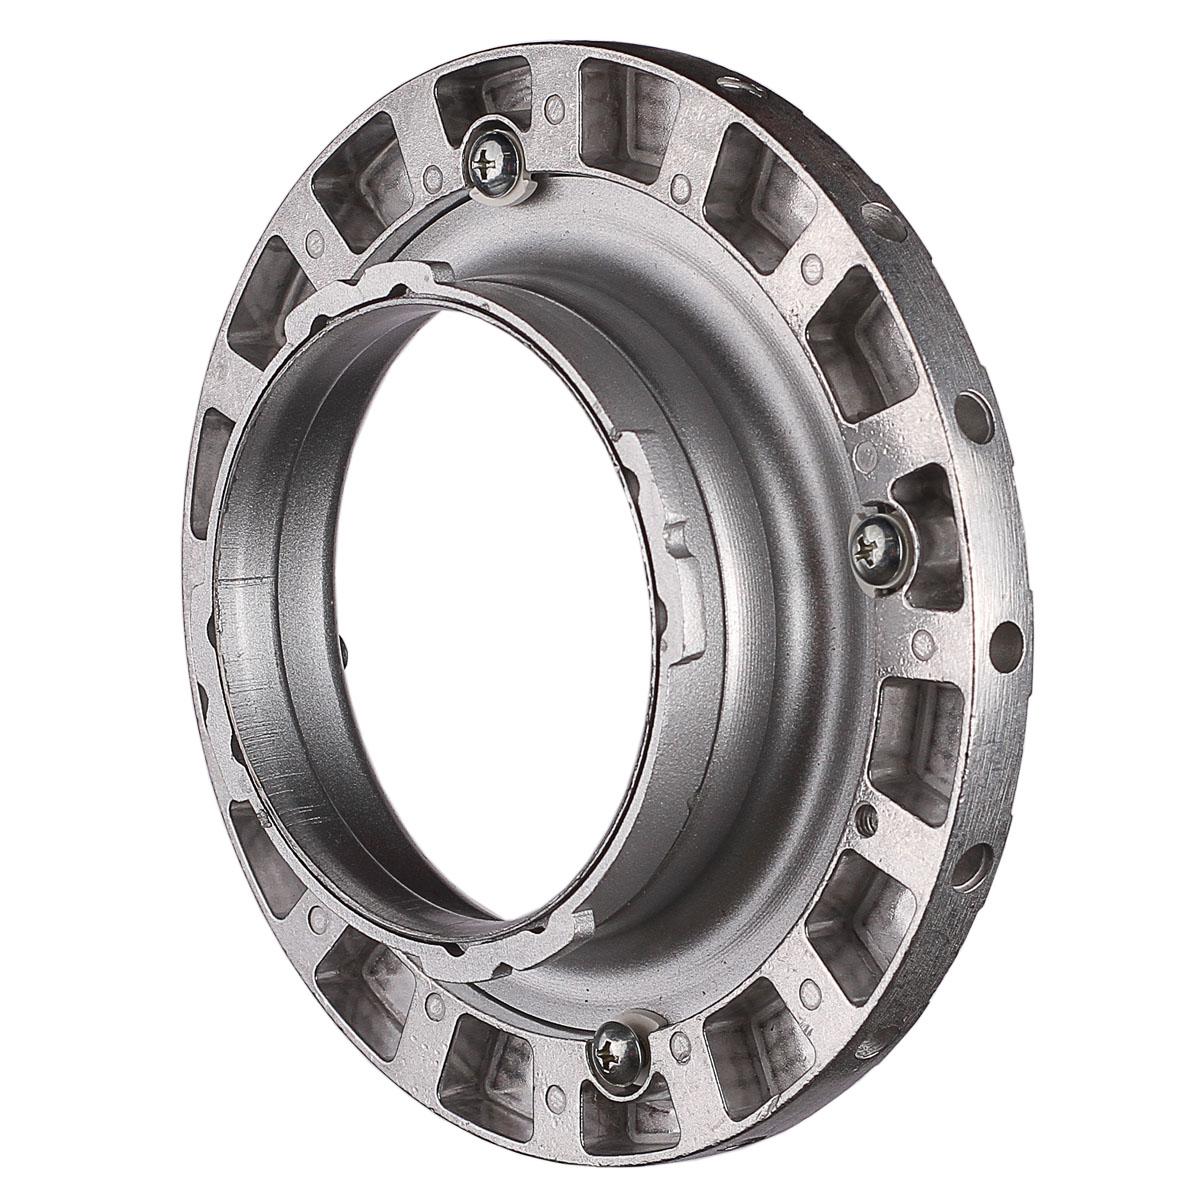 Phottix Speed Ring For Multiblitz (144mm, 16-Hole)